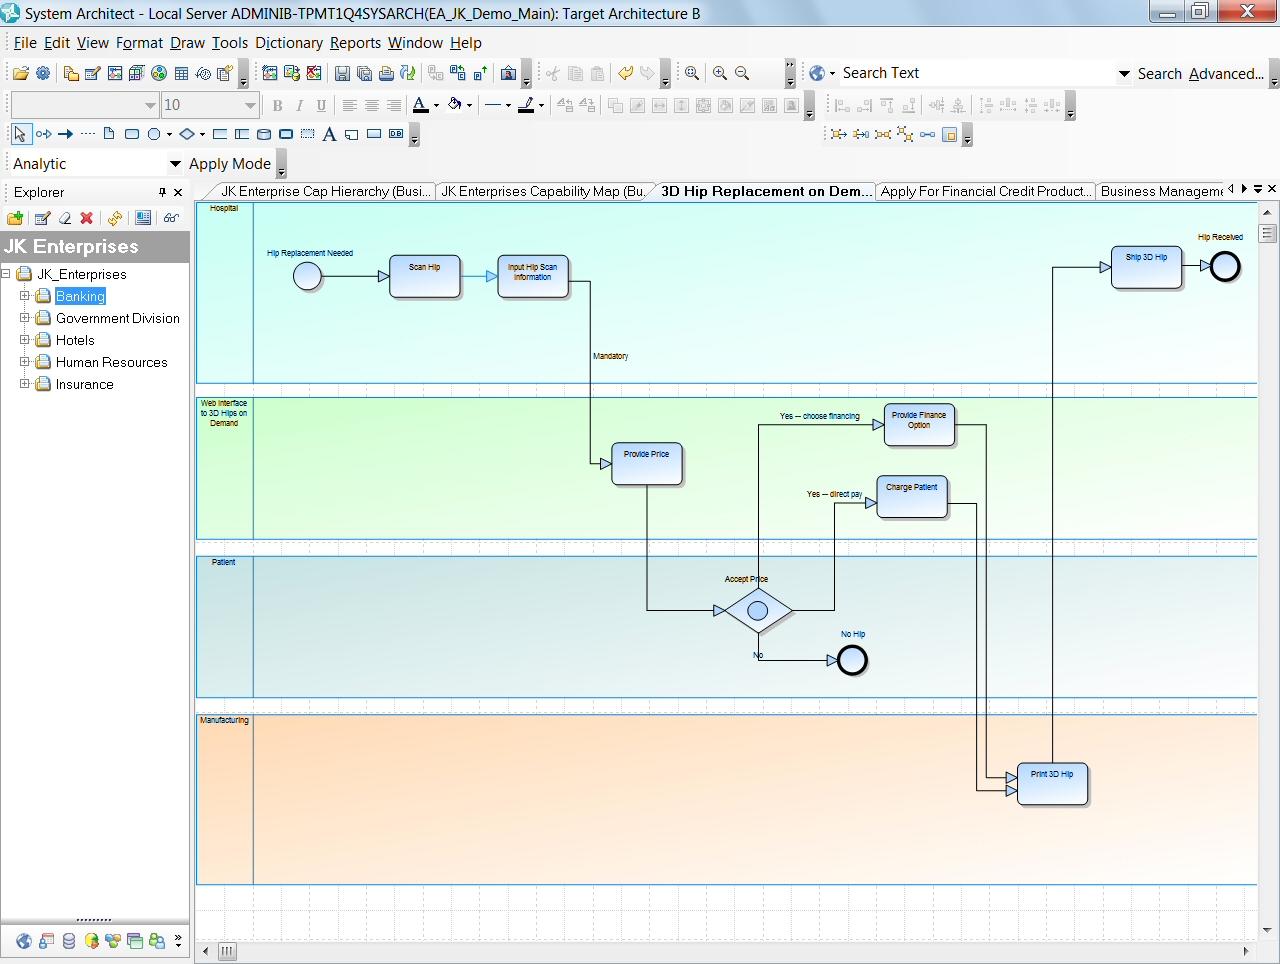 unicom systems teamblue system architect174